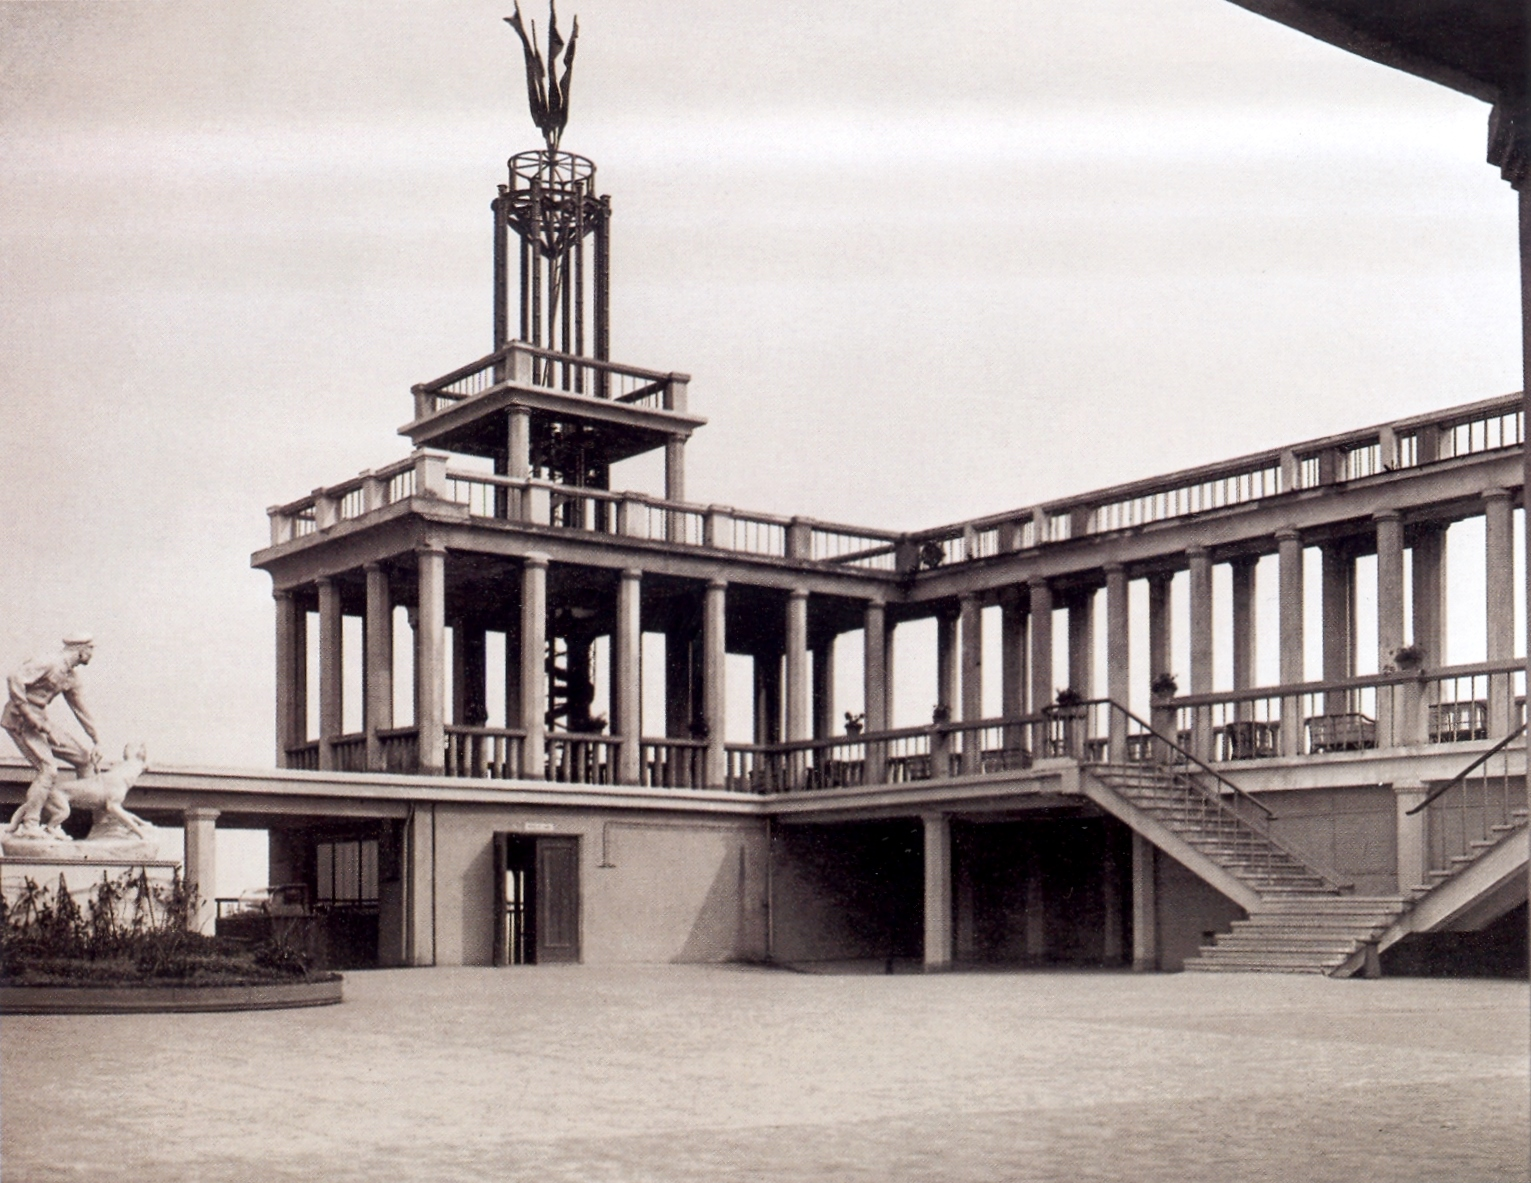 Крыша кинотеатр «Родина». Фото с сайта www.pastvu.com